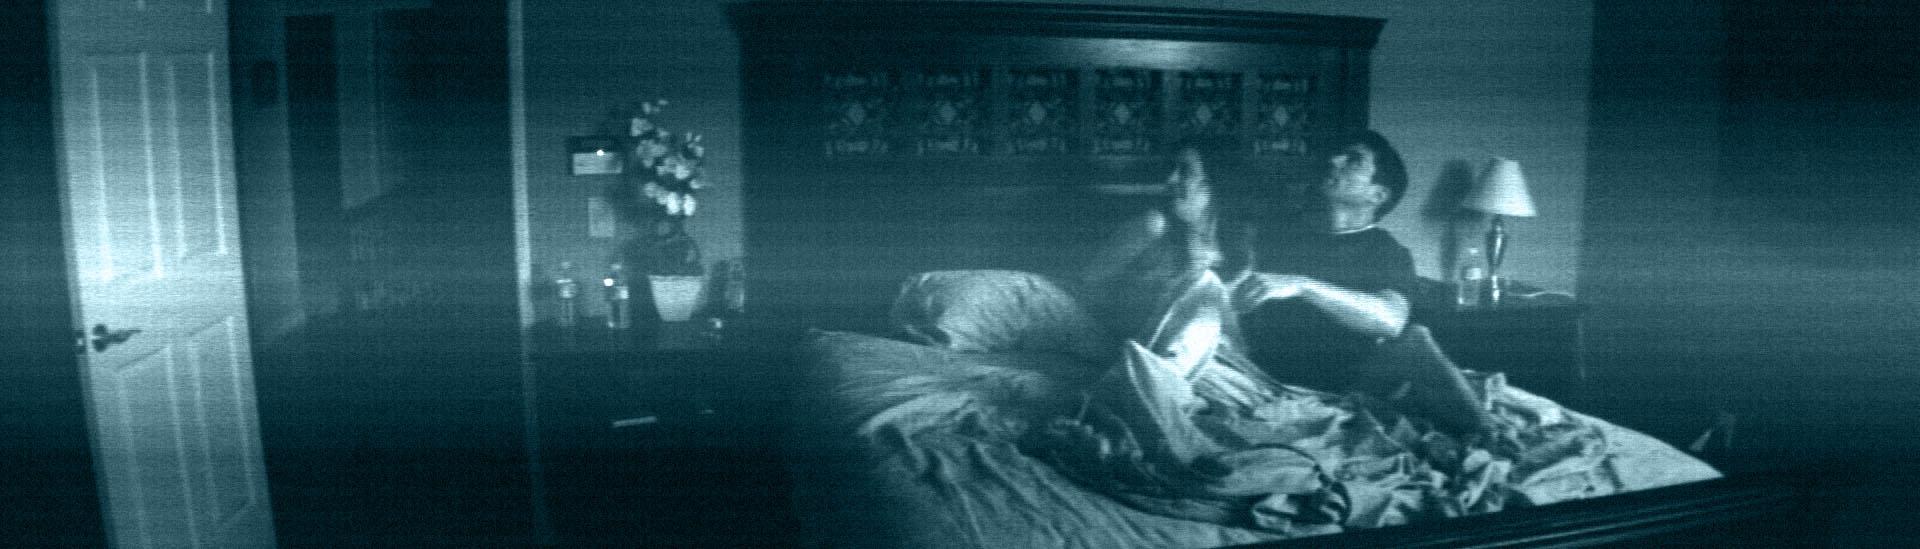 Baner filmu 'Paranormal Activity'